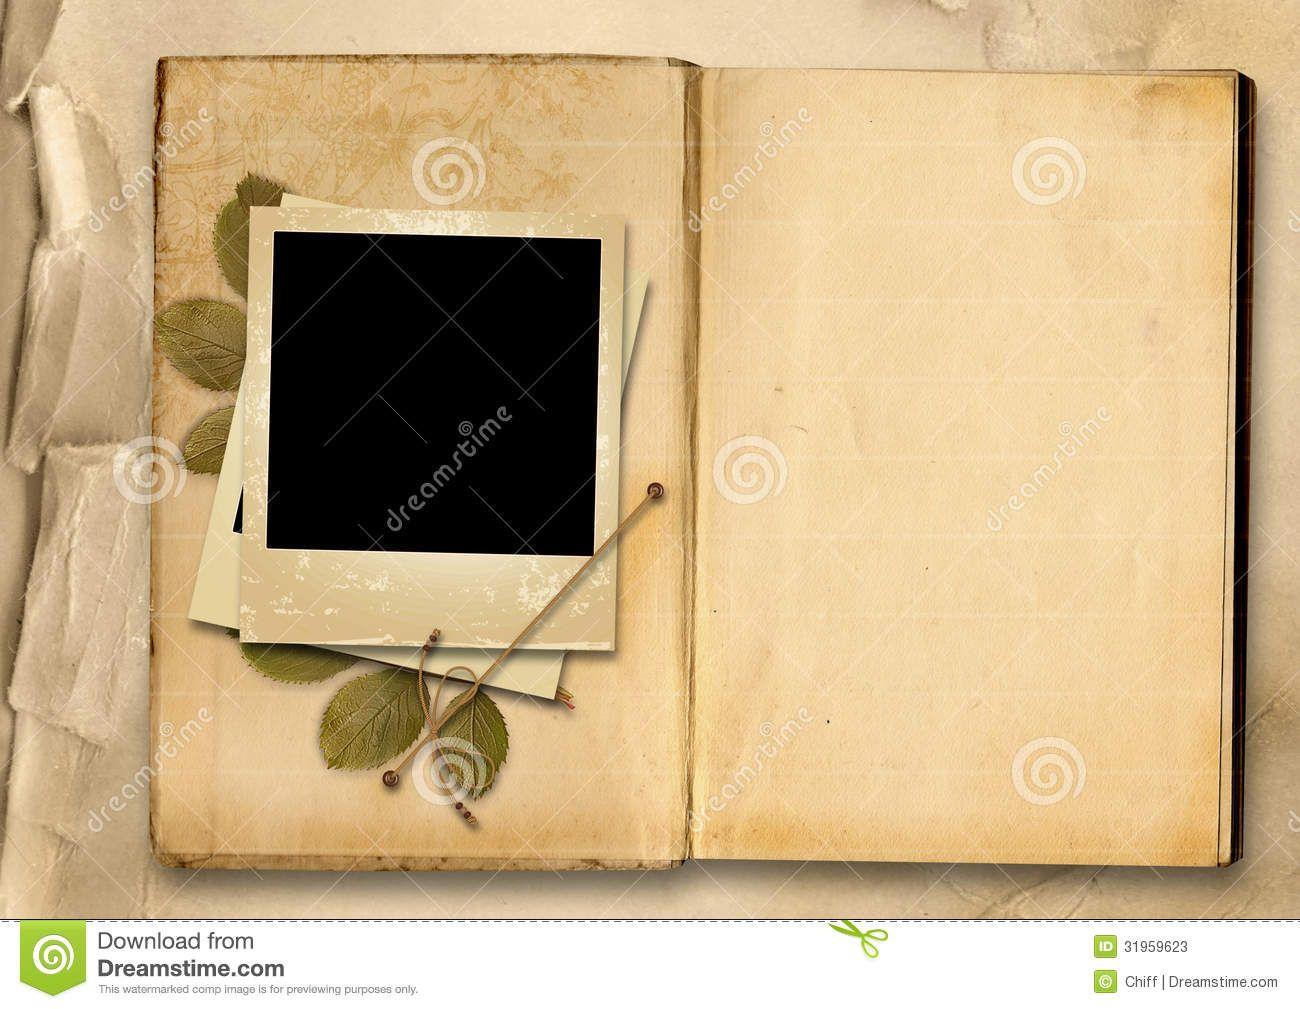 molduras antigas pesquisa google papel inajara pinterest vintage photo album polaroid. Black Bedroom Furniture Sets. Home Design Ideas